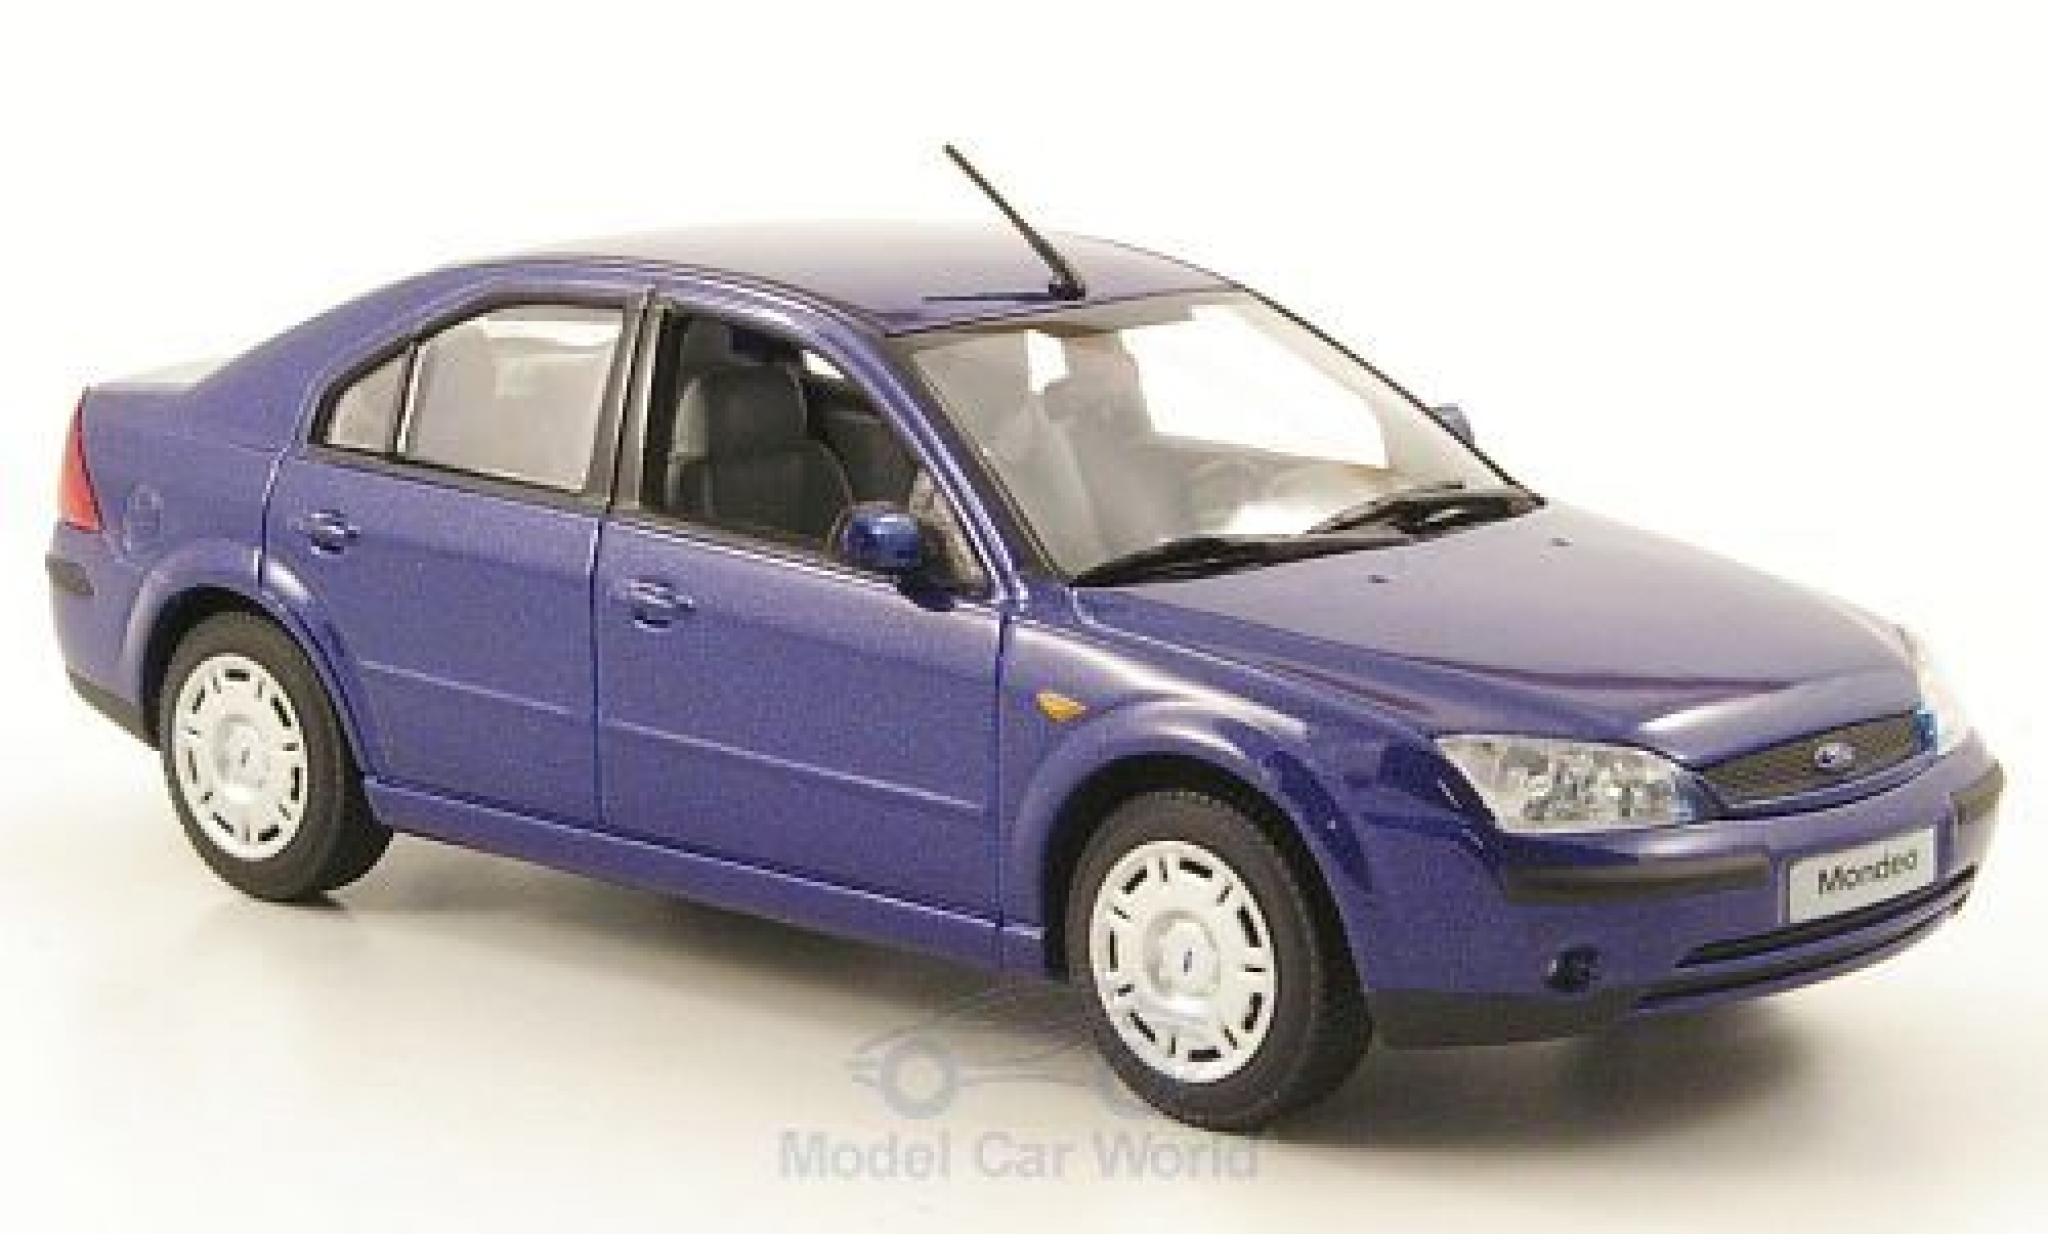 Ford Mondeo 2001 1/43 Minichamps MKIII metallise bleue Stufenheck